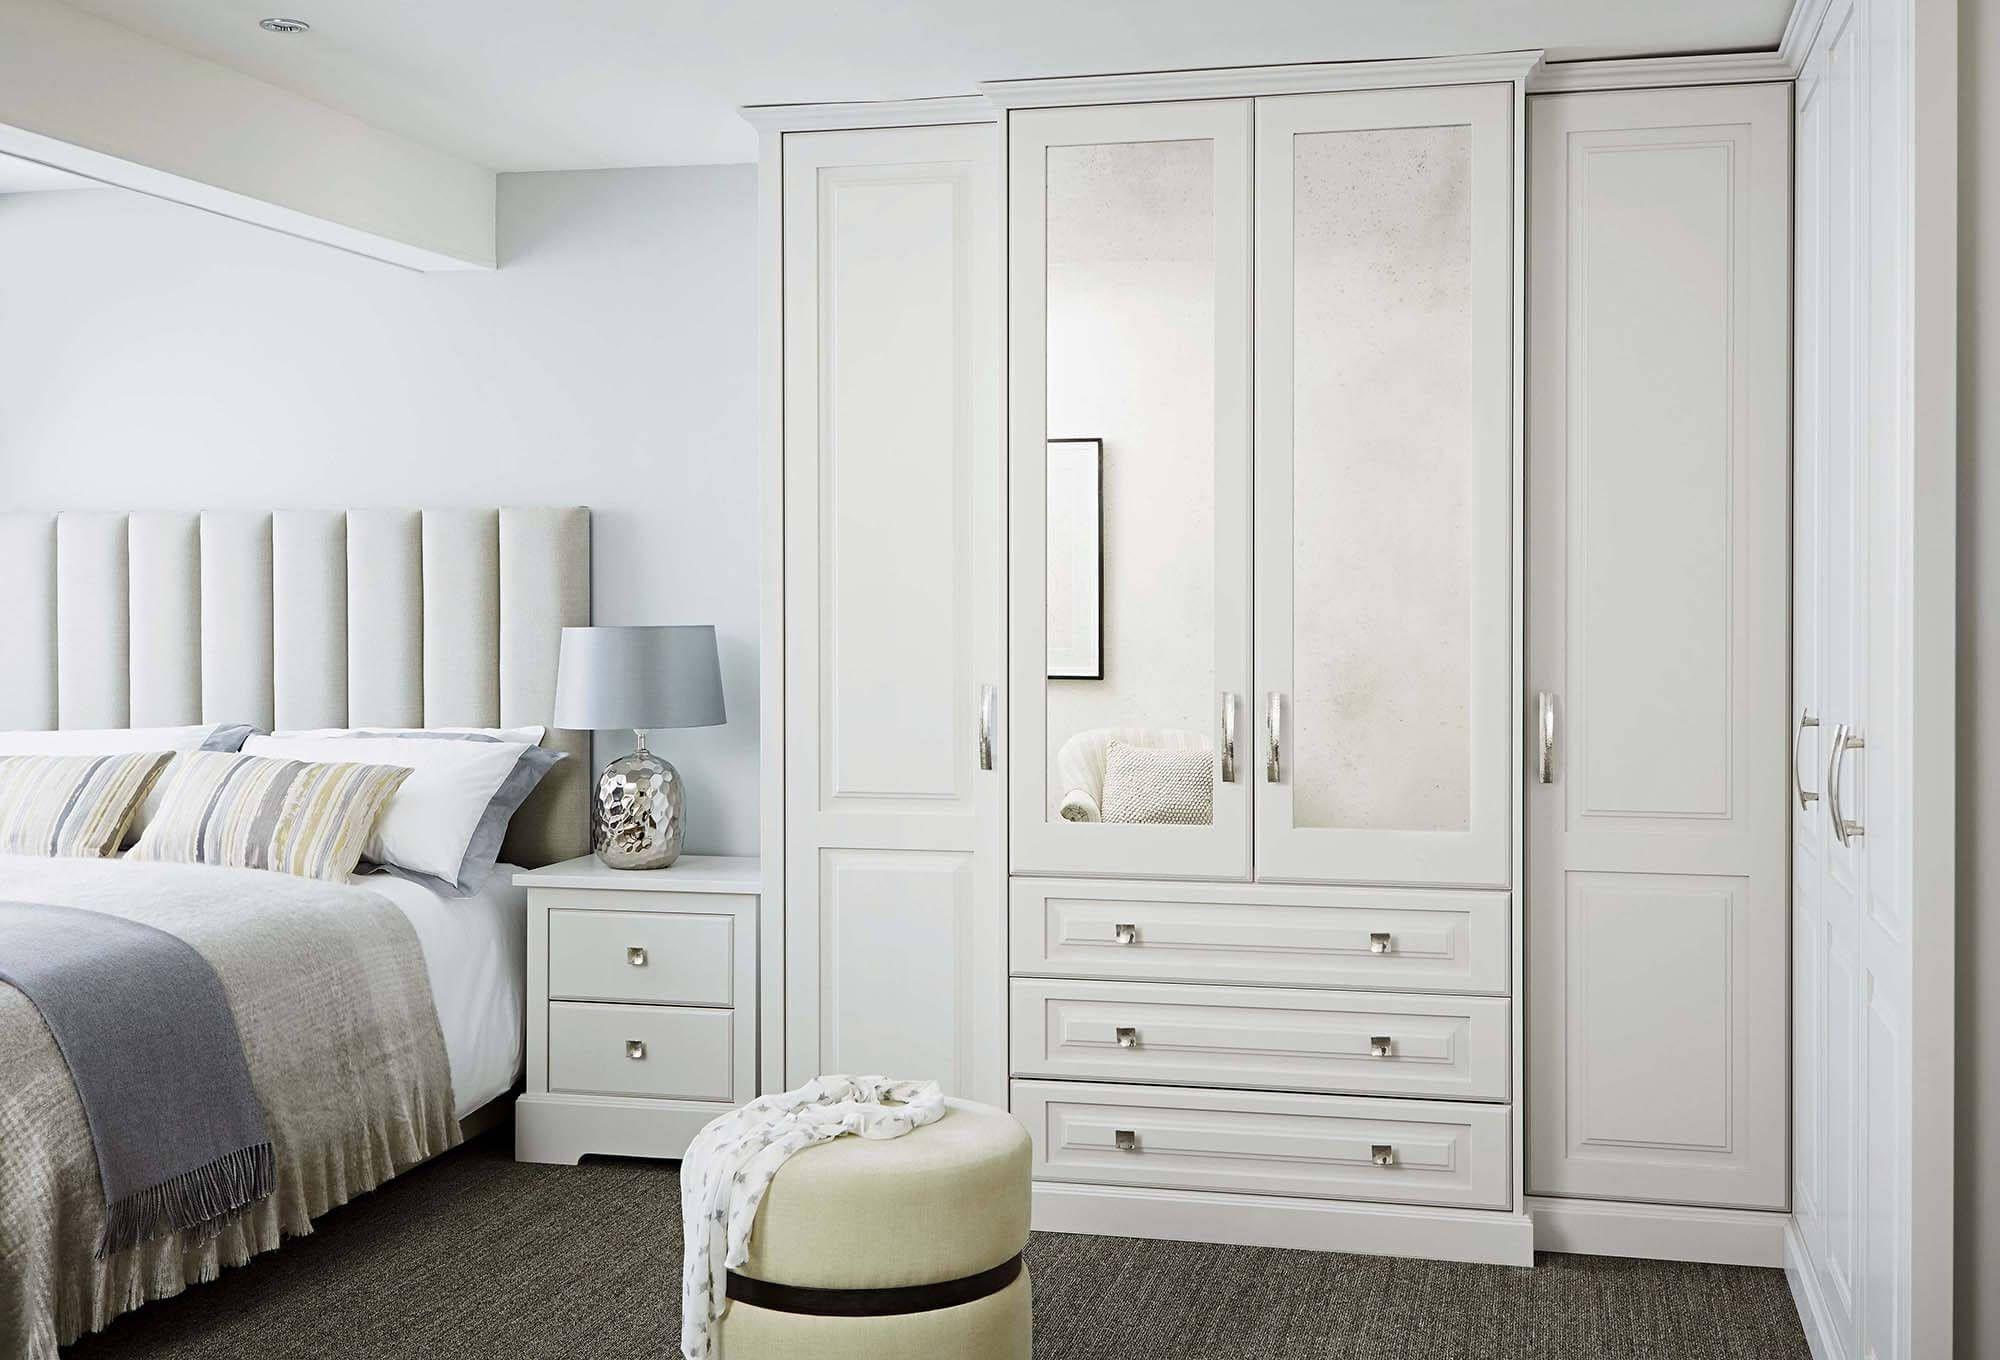 24 popular bedroom design this year artisan